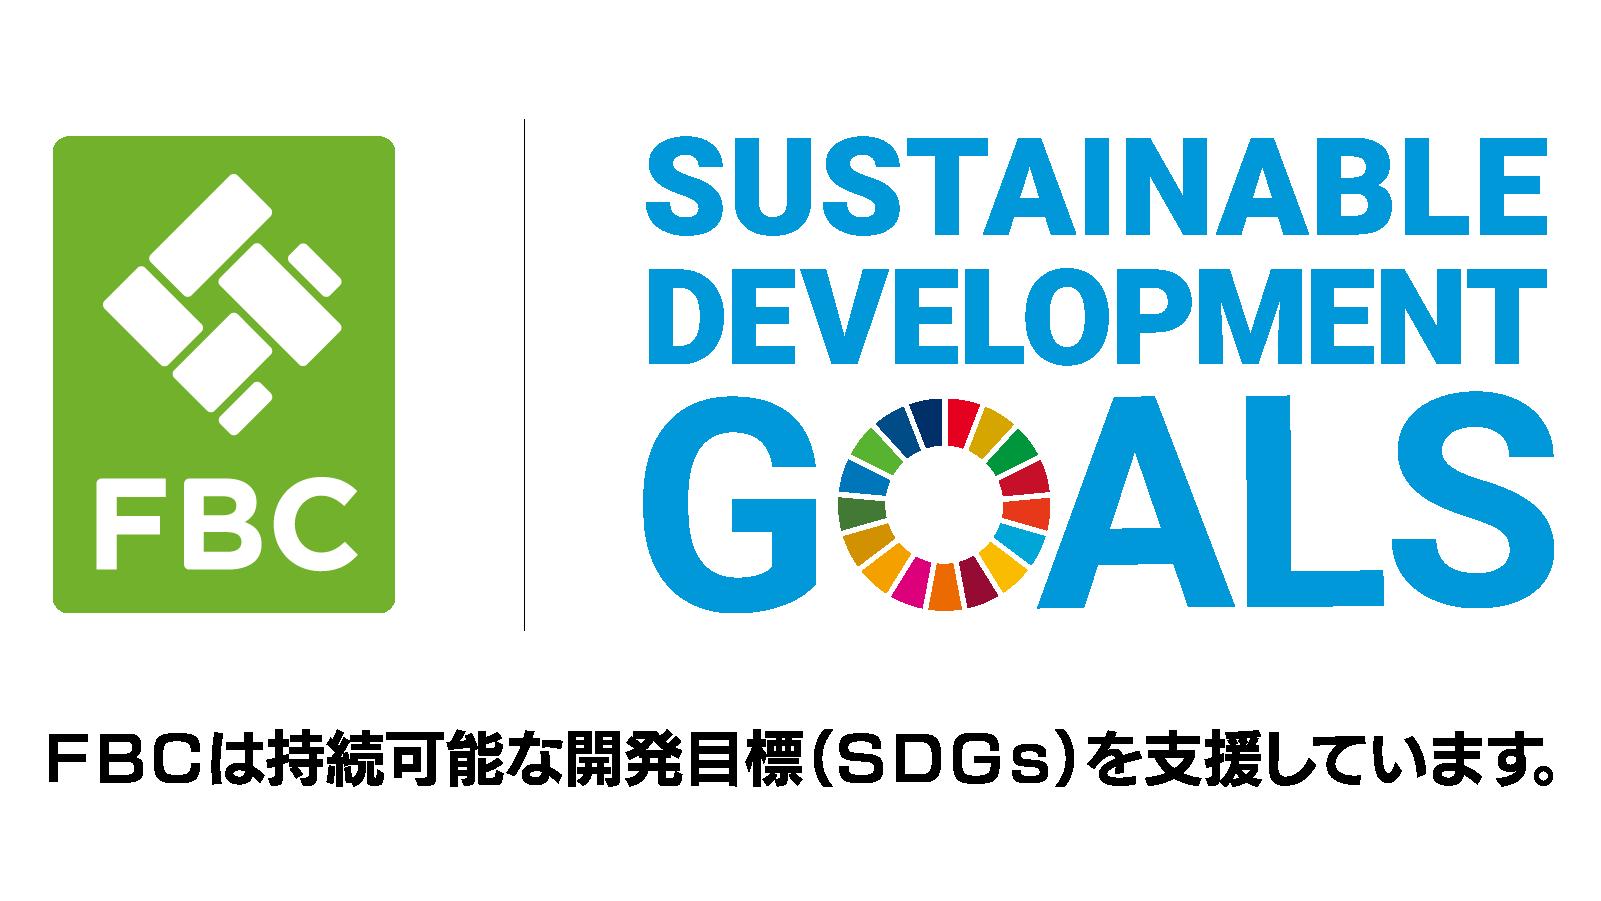 FBC SDGs